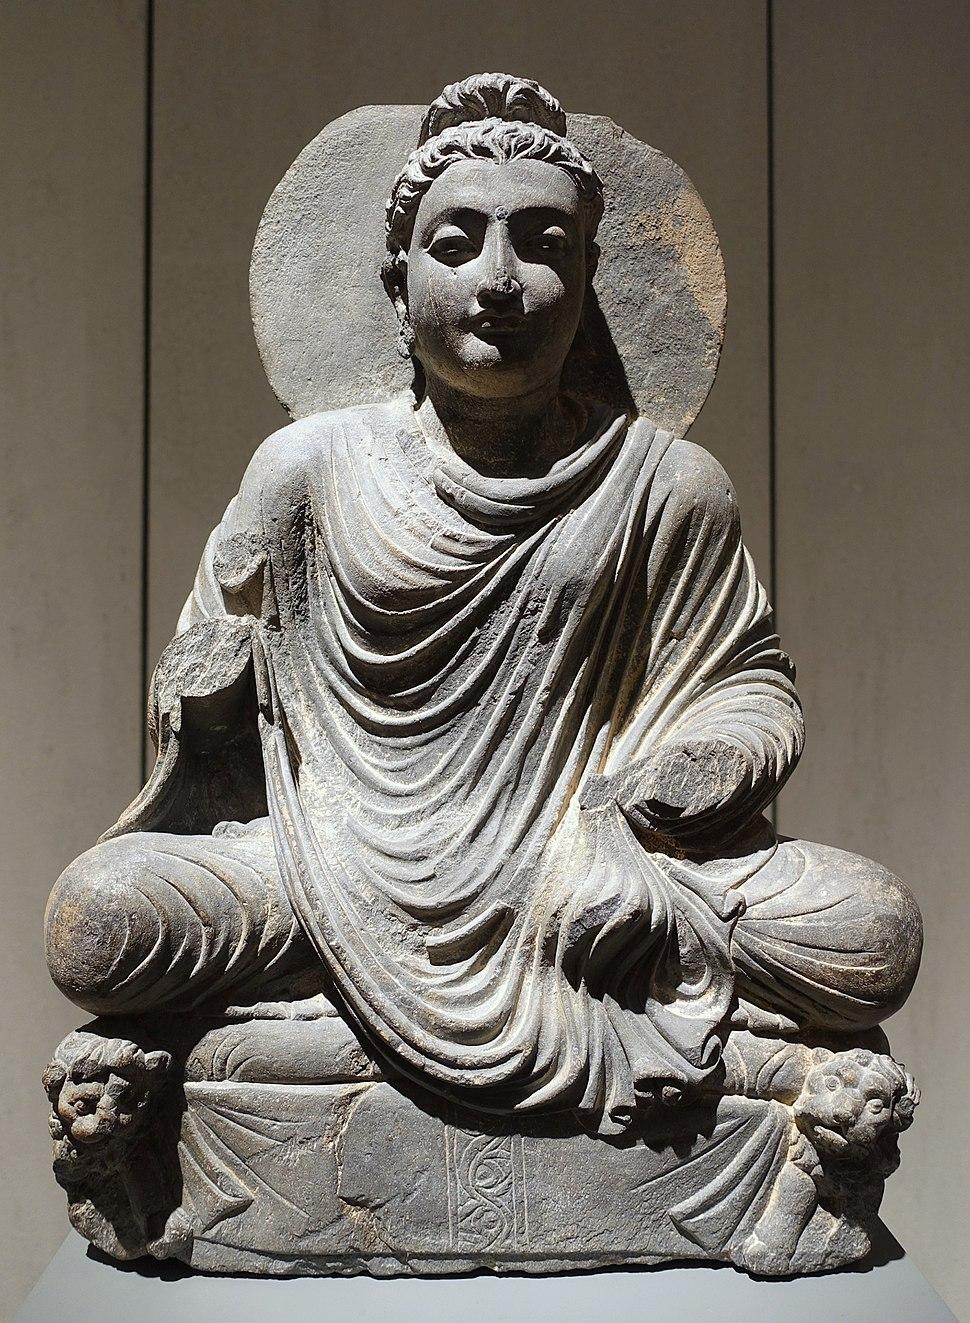 Buddha on Lion Throne, Takht-i-Bahi, Gandhara, 2nd-3rd century AD, schist - Ethnological Museum, Berlin - DSC01656